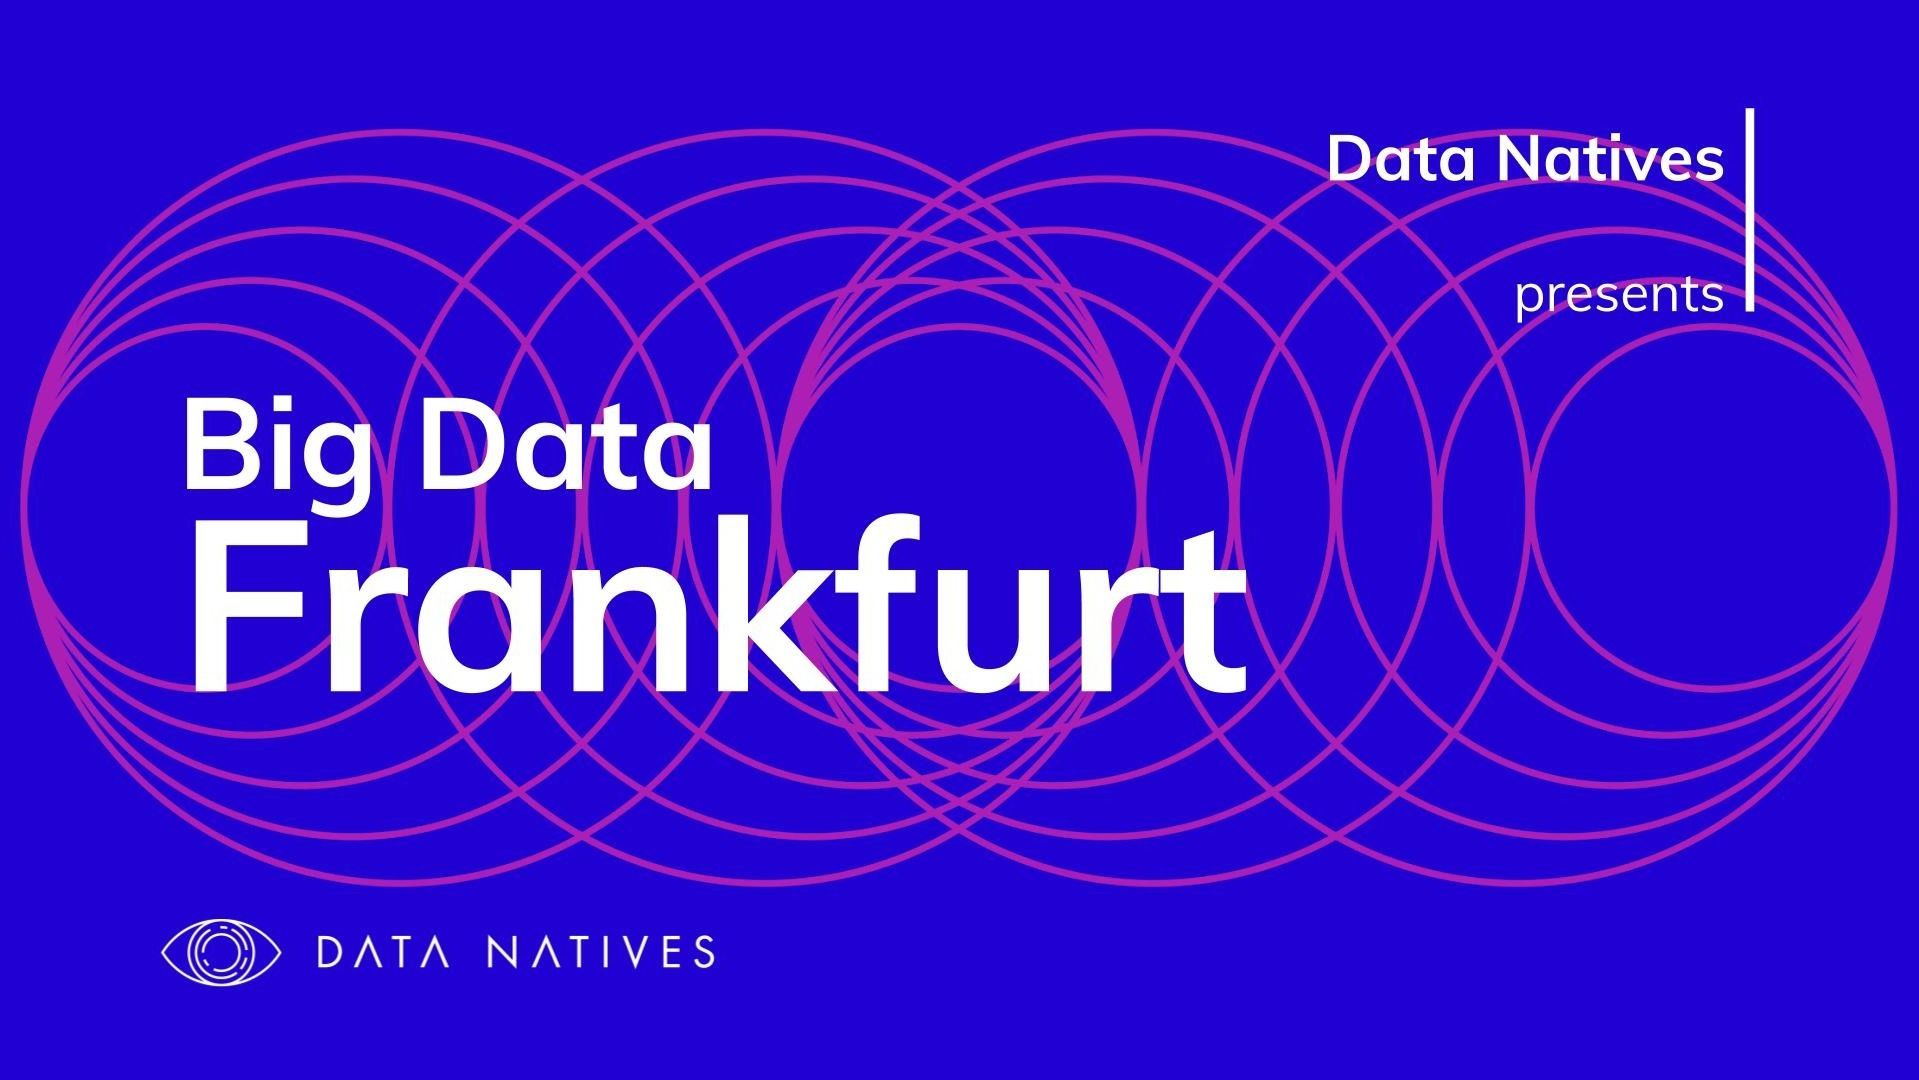 Big Data, Frankfurt